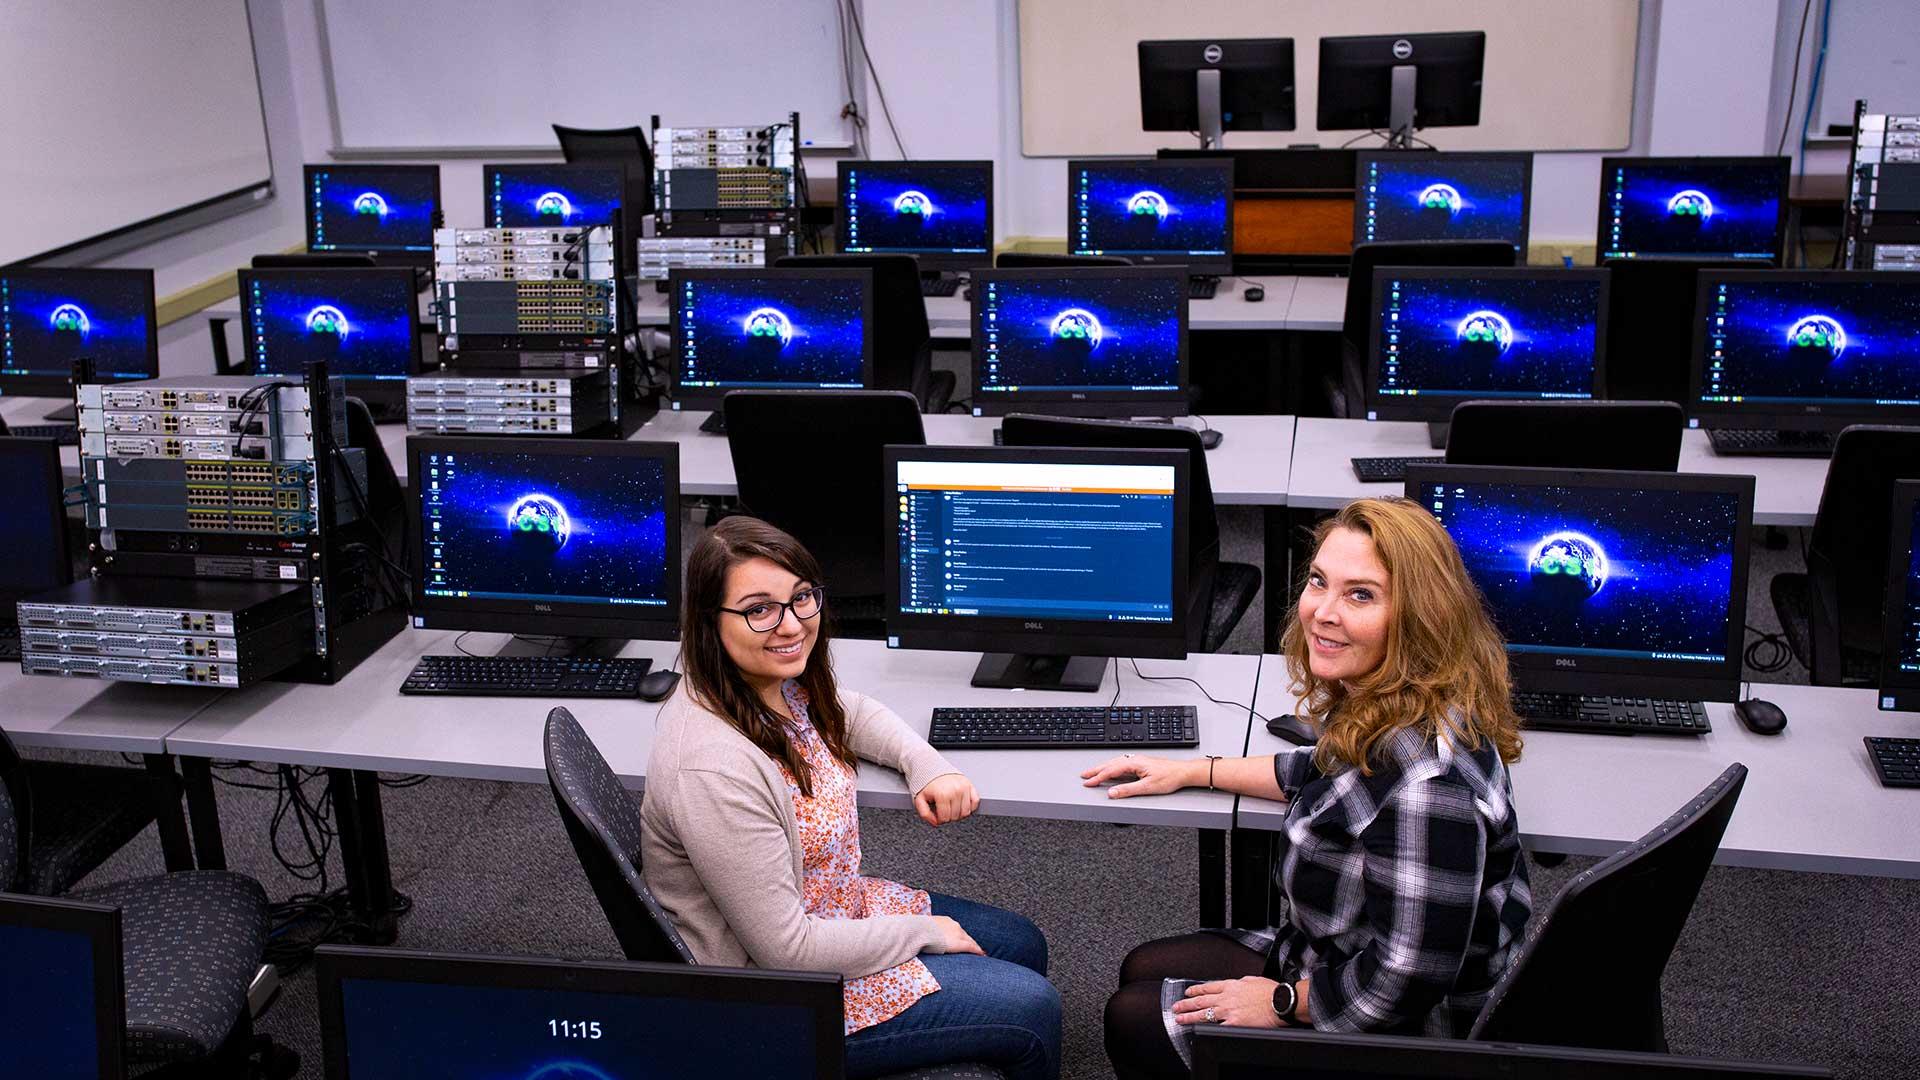 Undergraduate student researcher to present findings to legislators in Austin